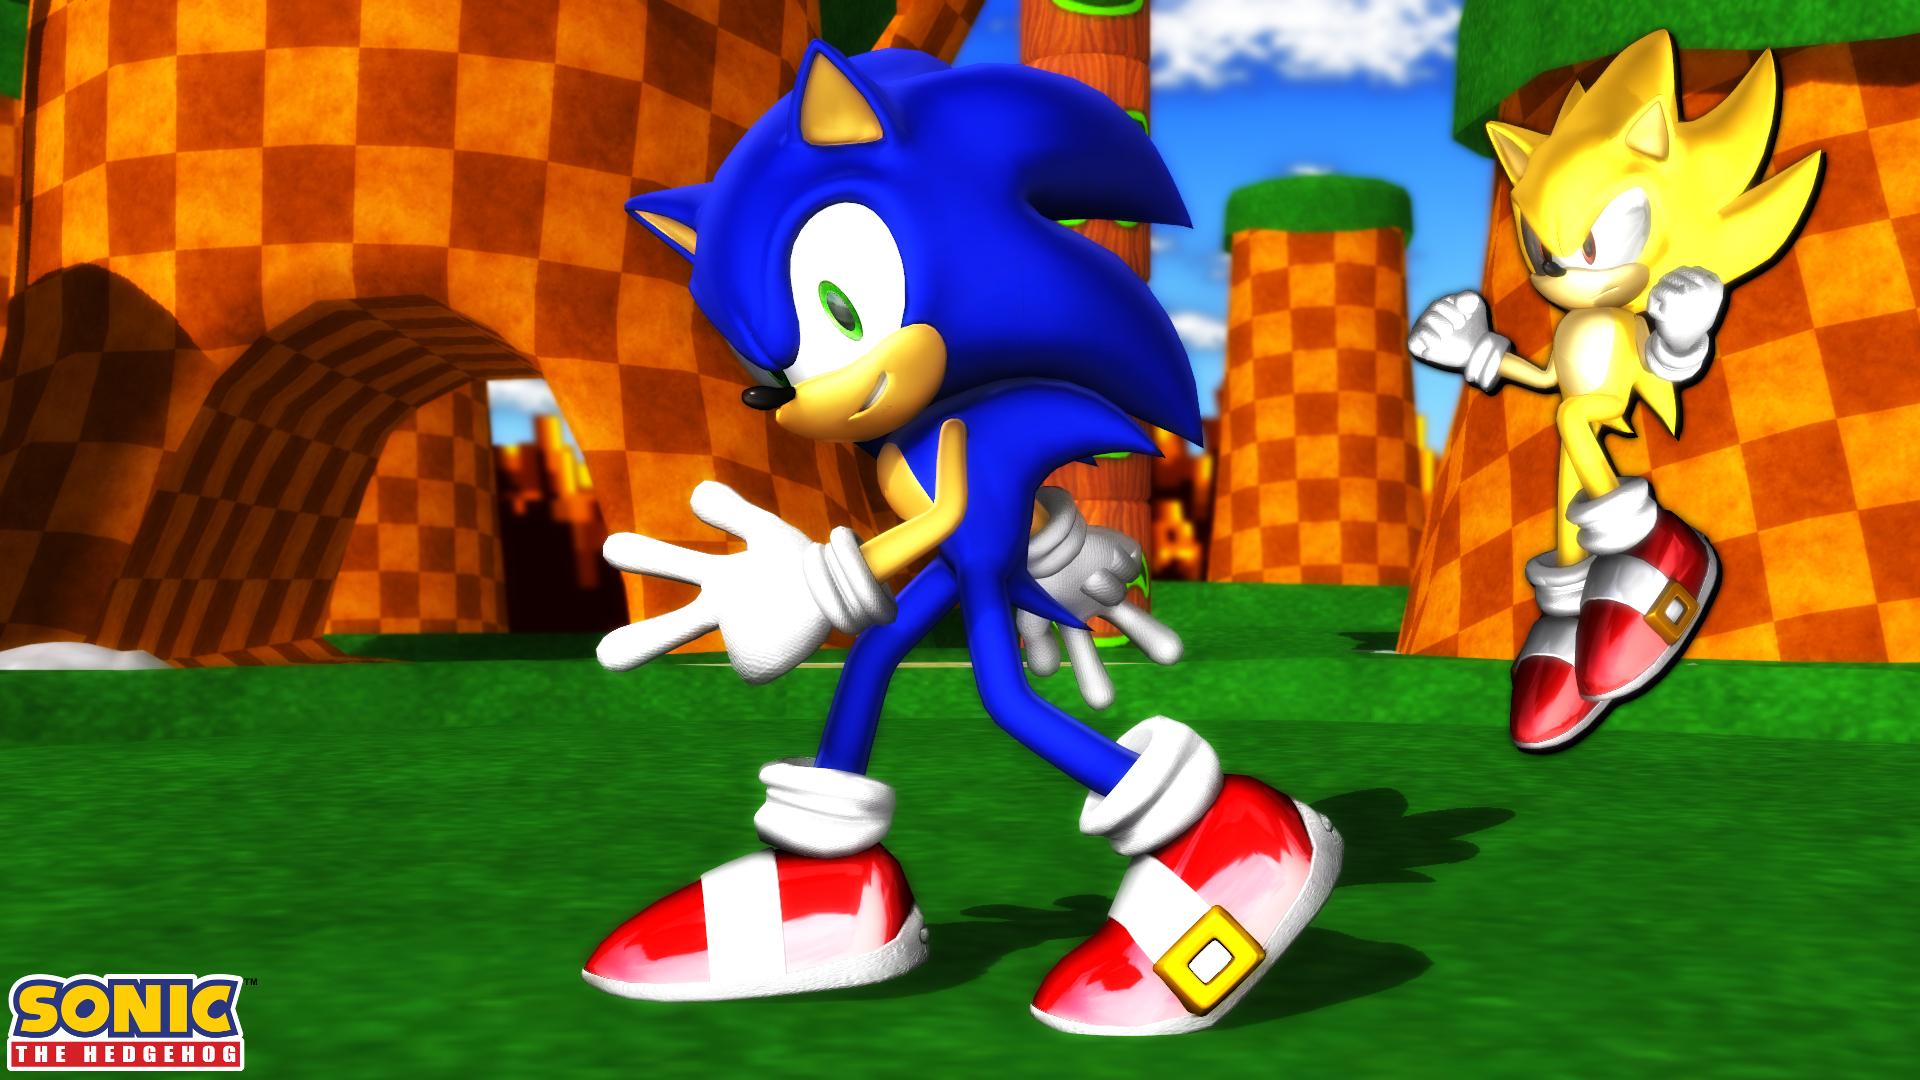 HD Q'1080p)))~Sonic the Hedgehog #FULL MOVIE Download ... | 1080x1920